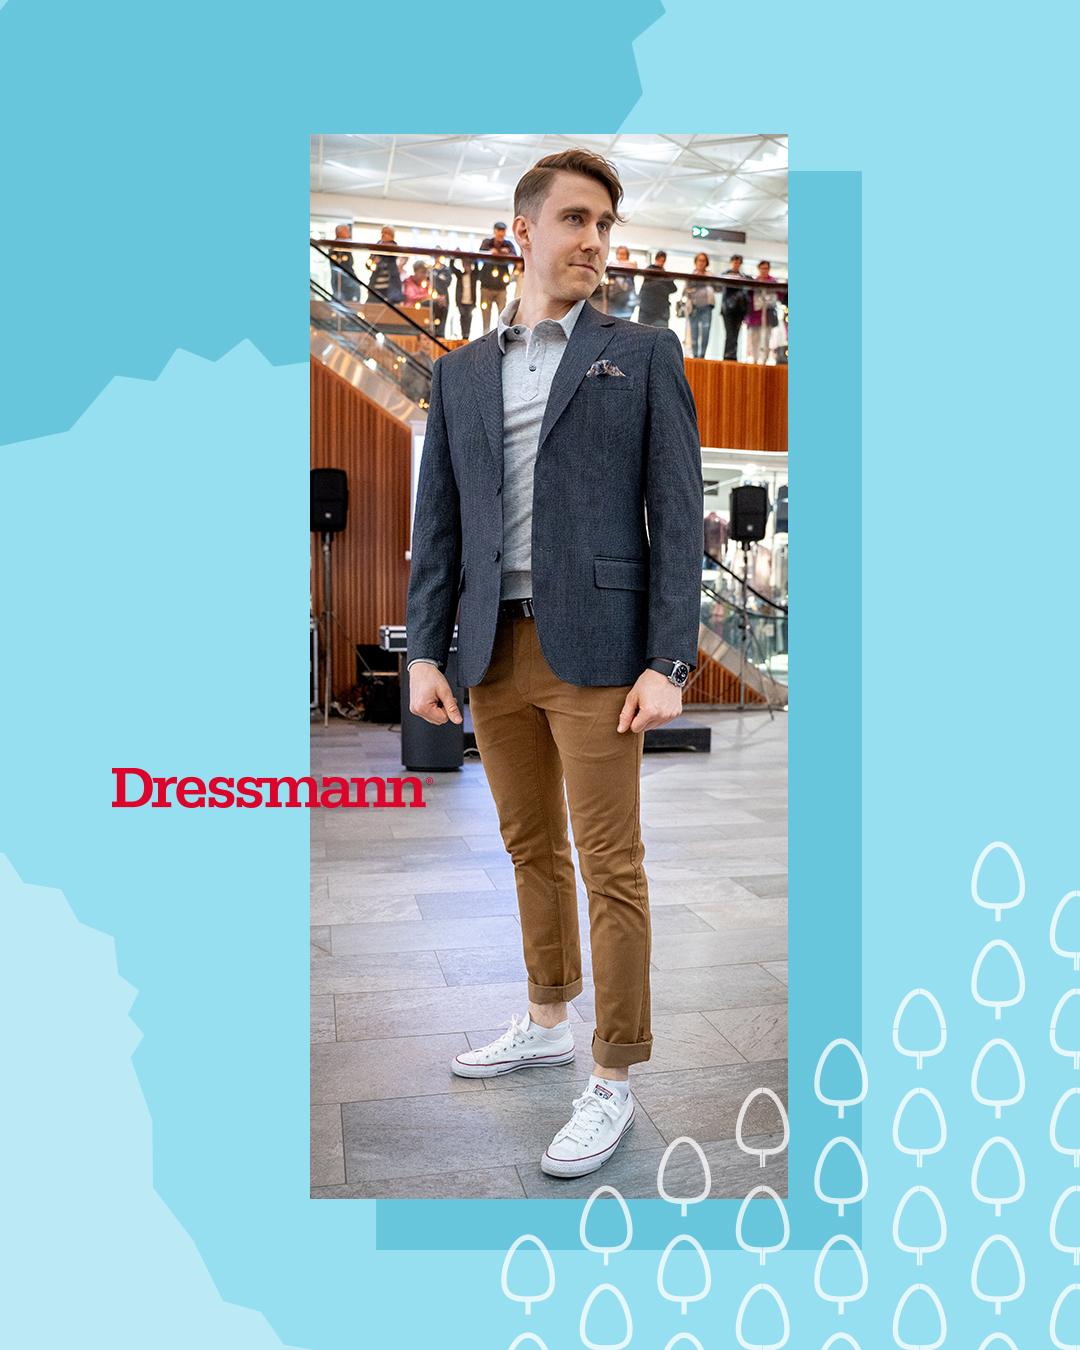 Dressmann asu